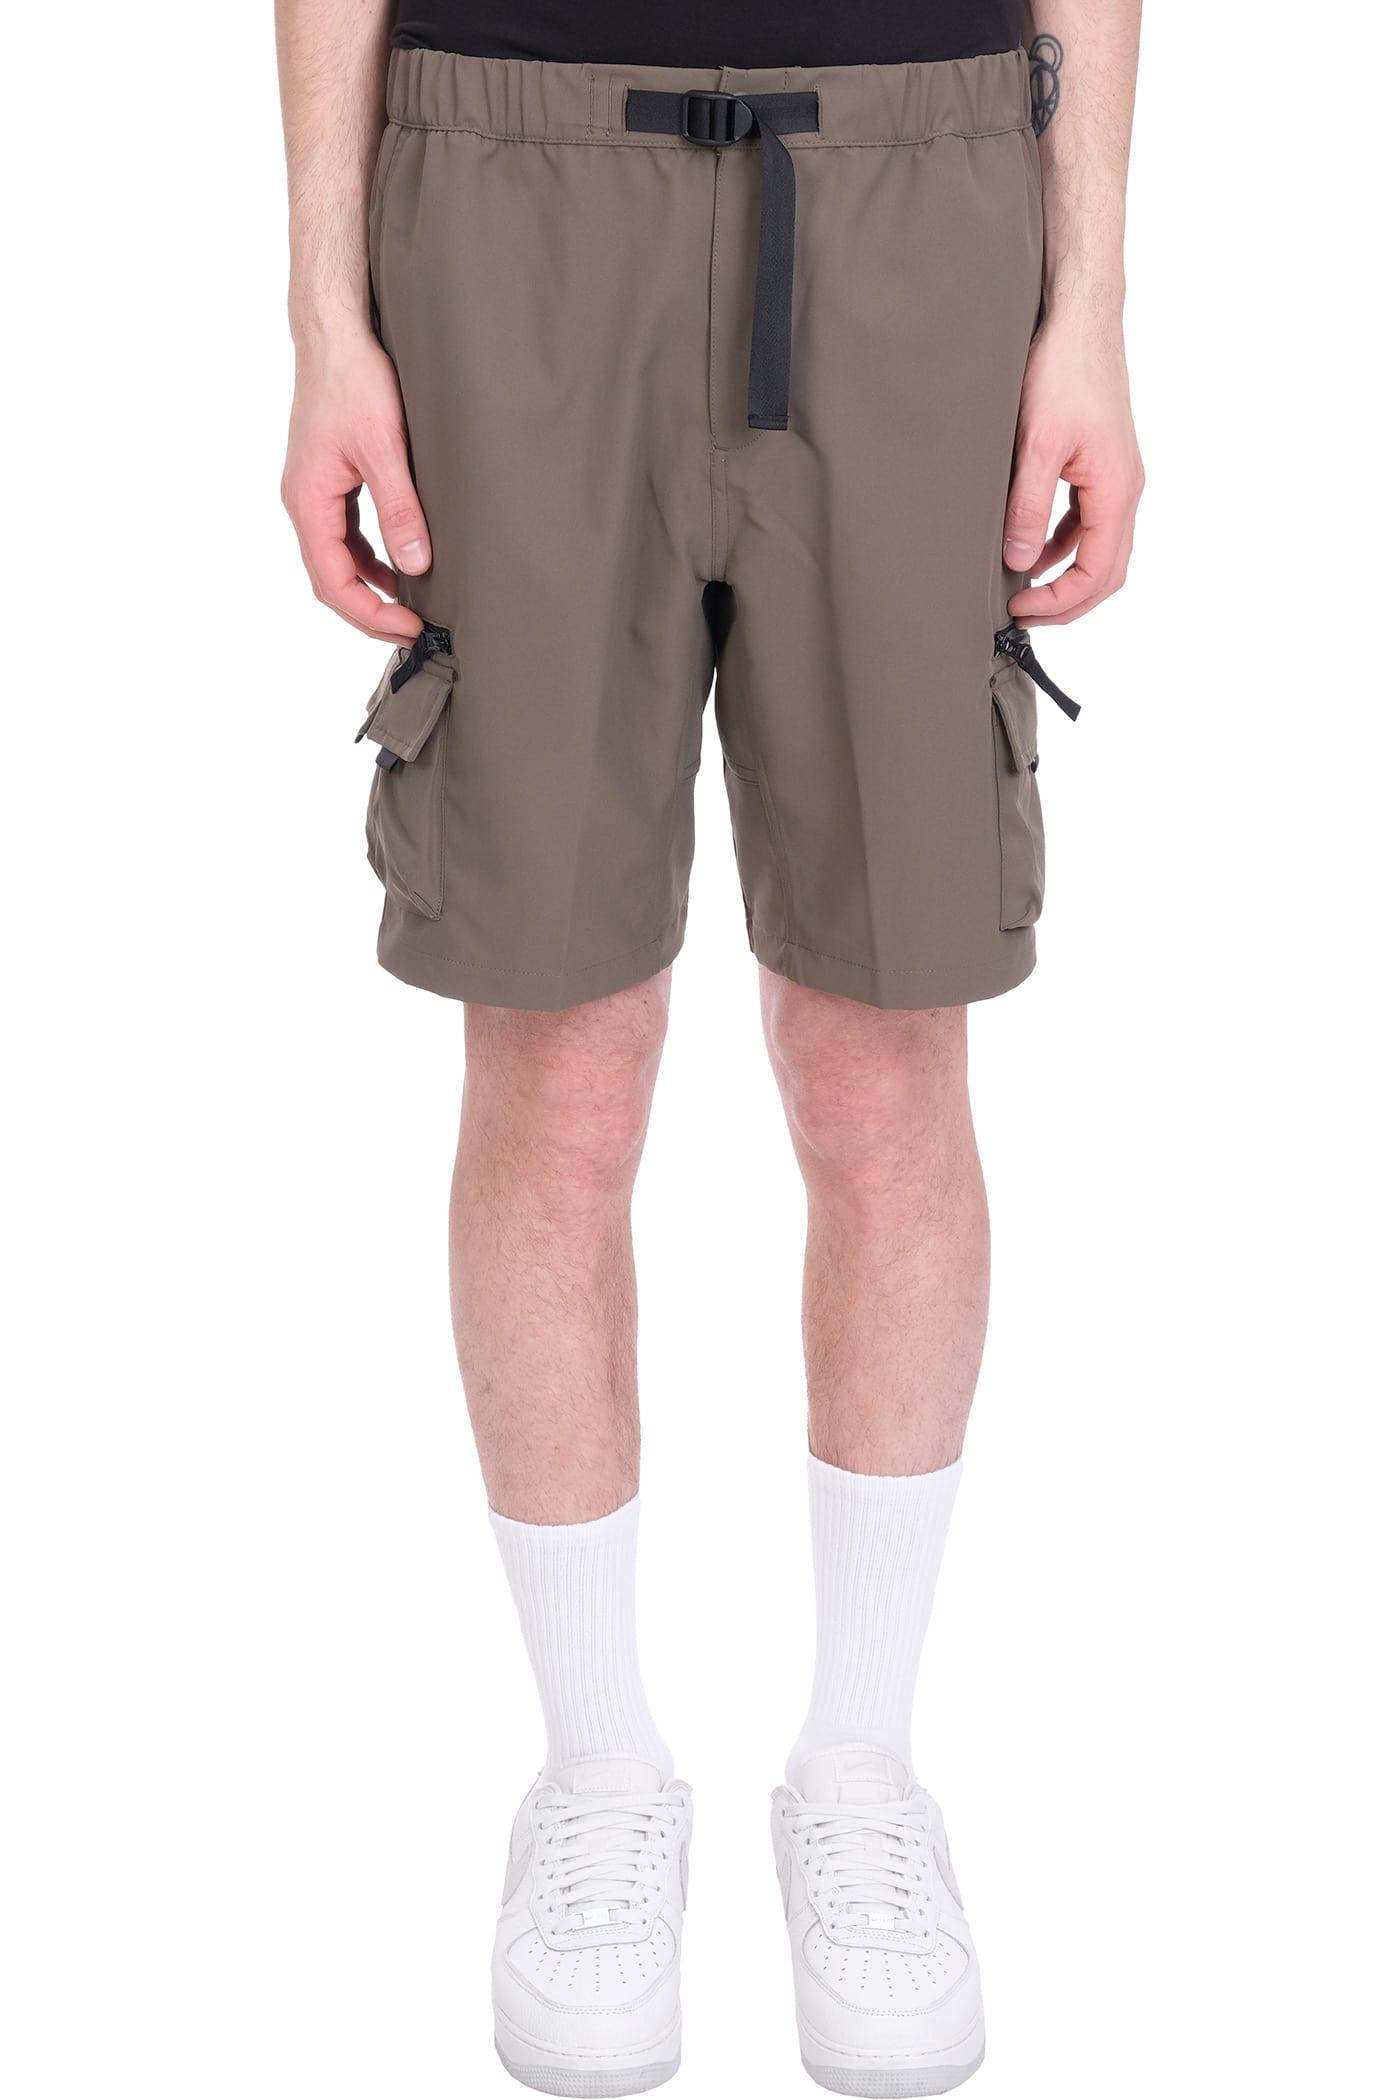 Carhartt Shorts SHORTS IN GREEN POLYESTER